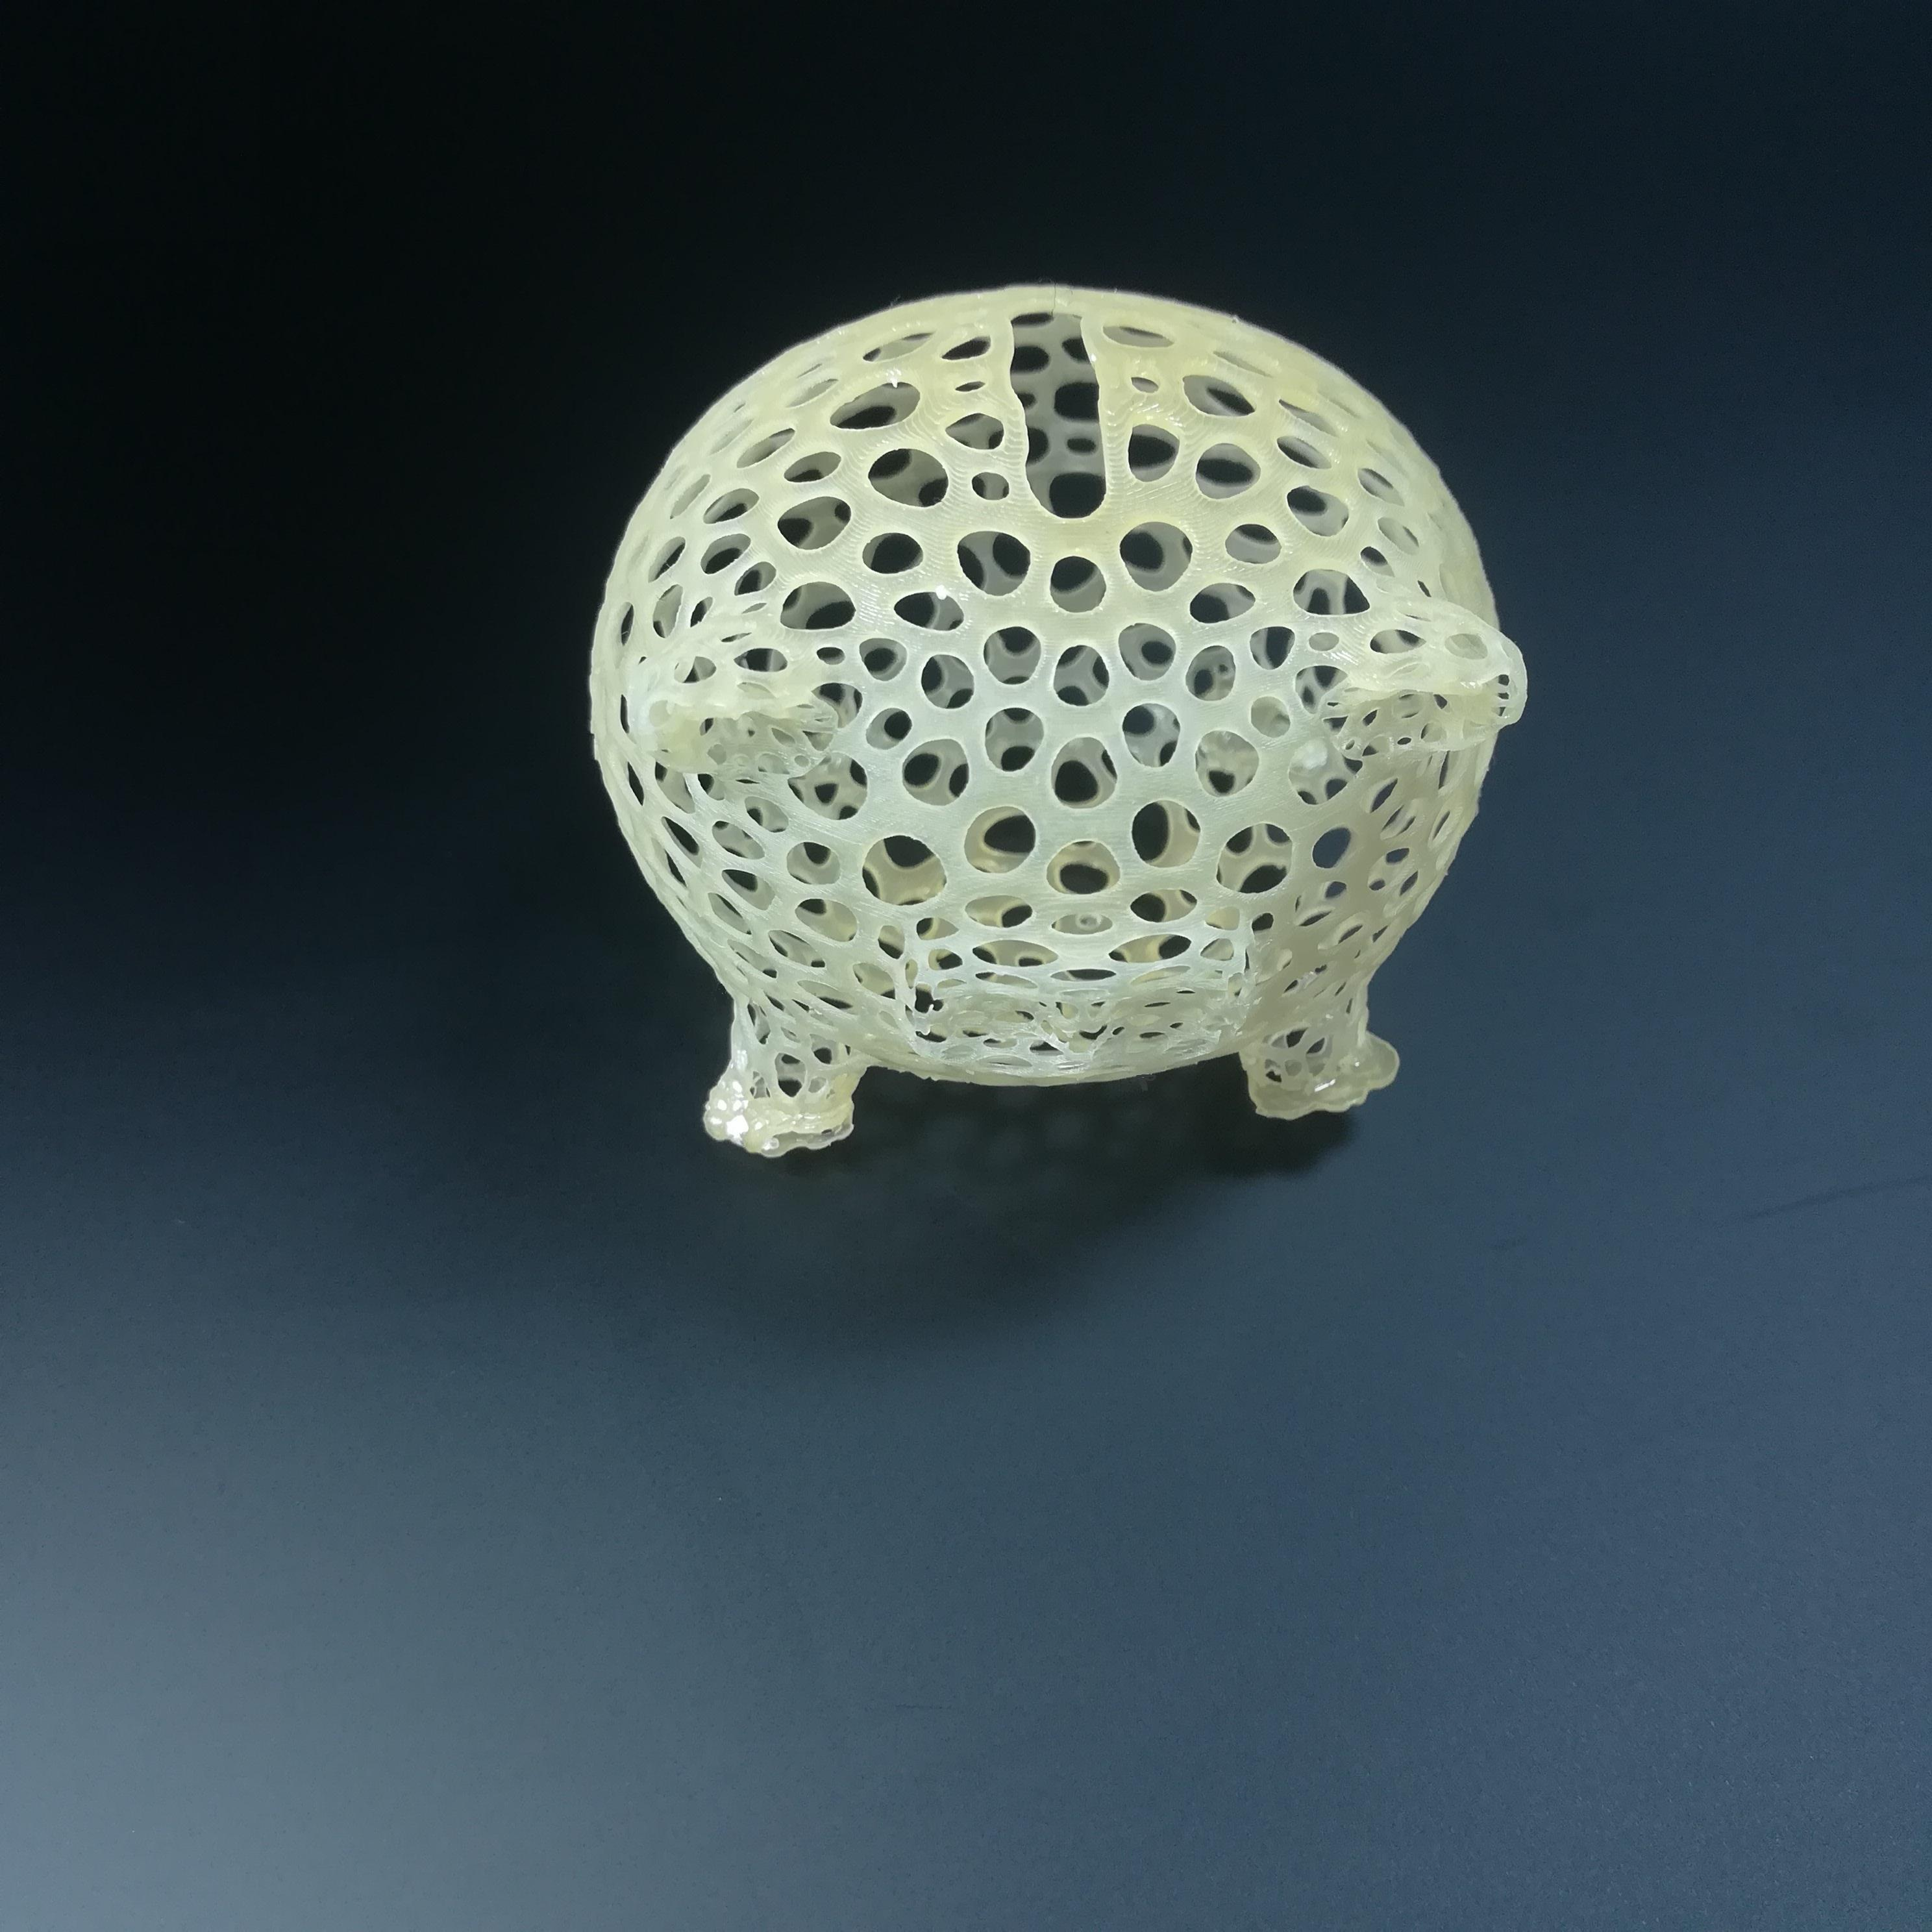 3d Printable Voronoi Piggy Bank By Tom David